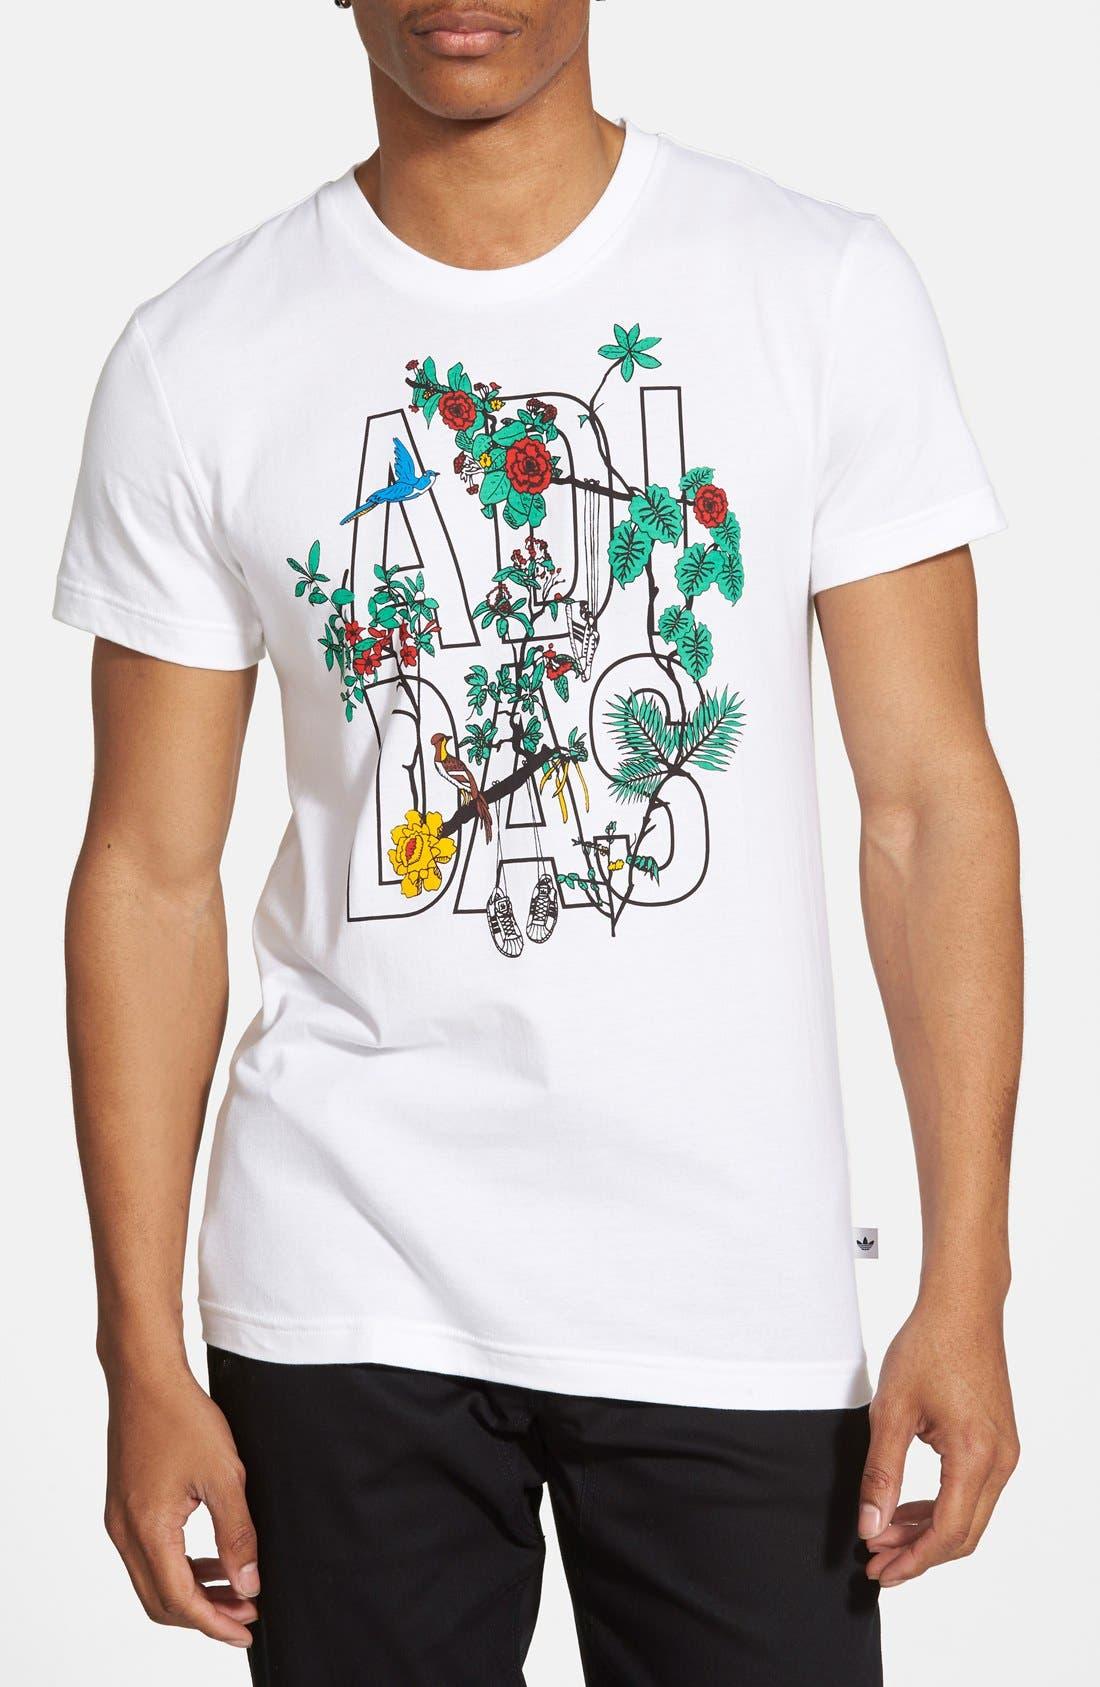 ADIDAS ORIGINALS 'Island Superstar' Graphic T-Shirt, Main, color, 100